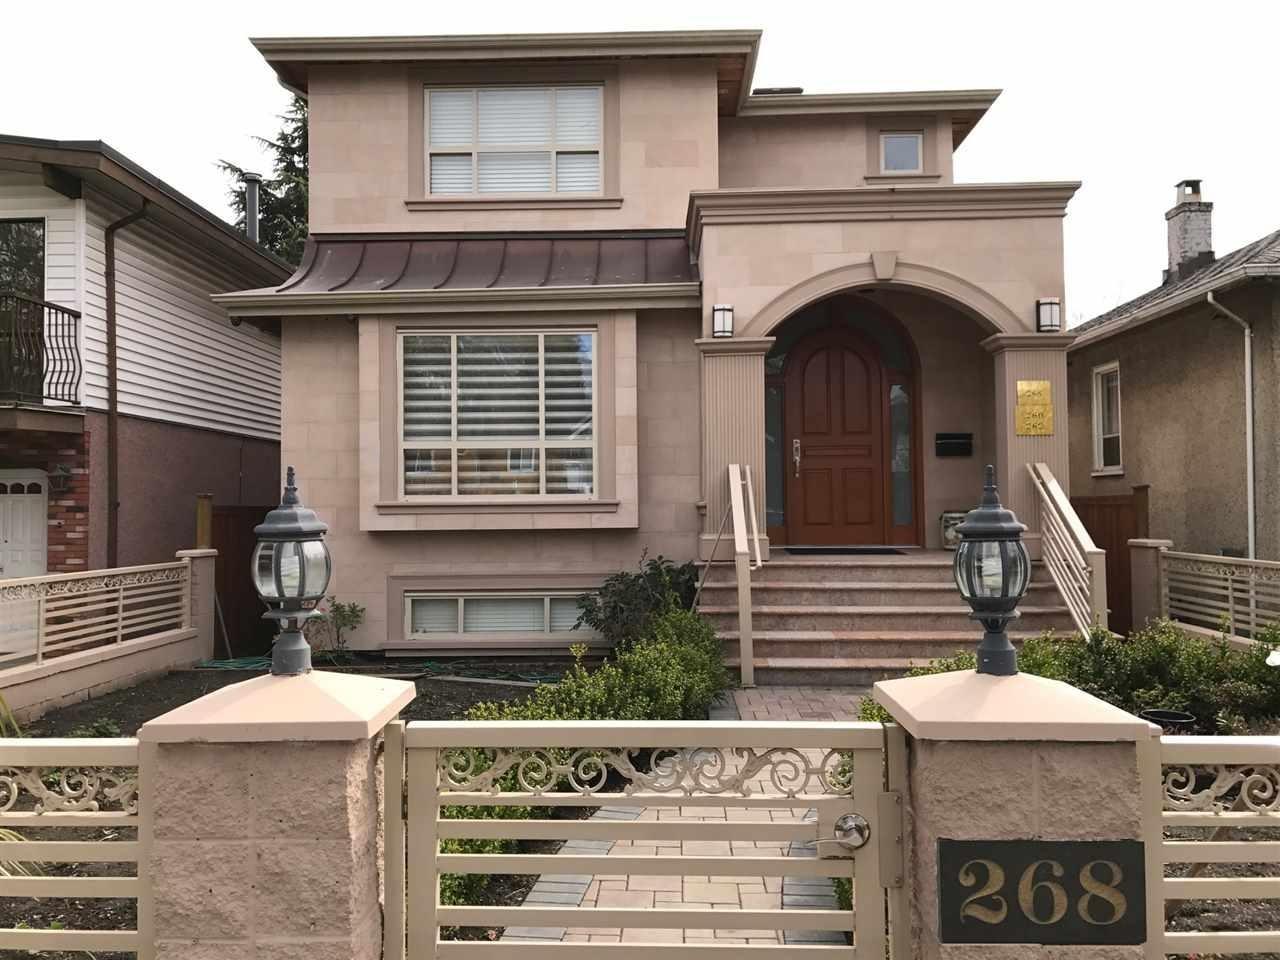 R2156623 - 268 E 48TH AVENUE, Main, Vancouver, BC - House/Single Family